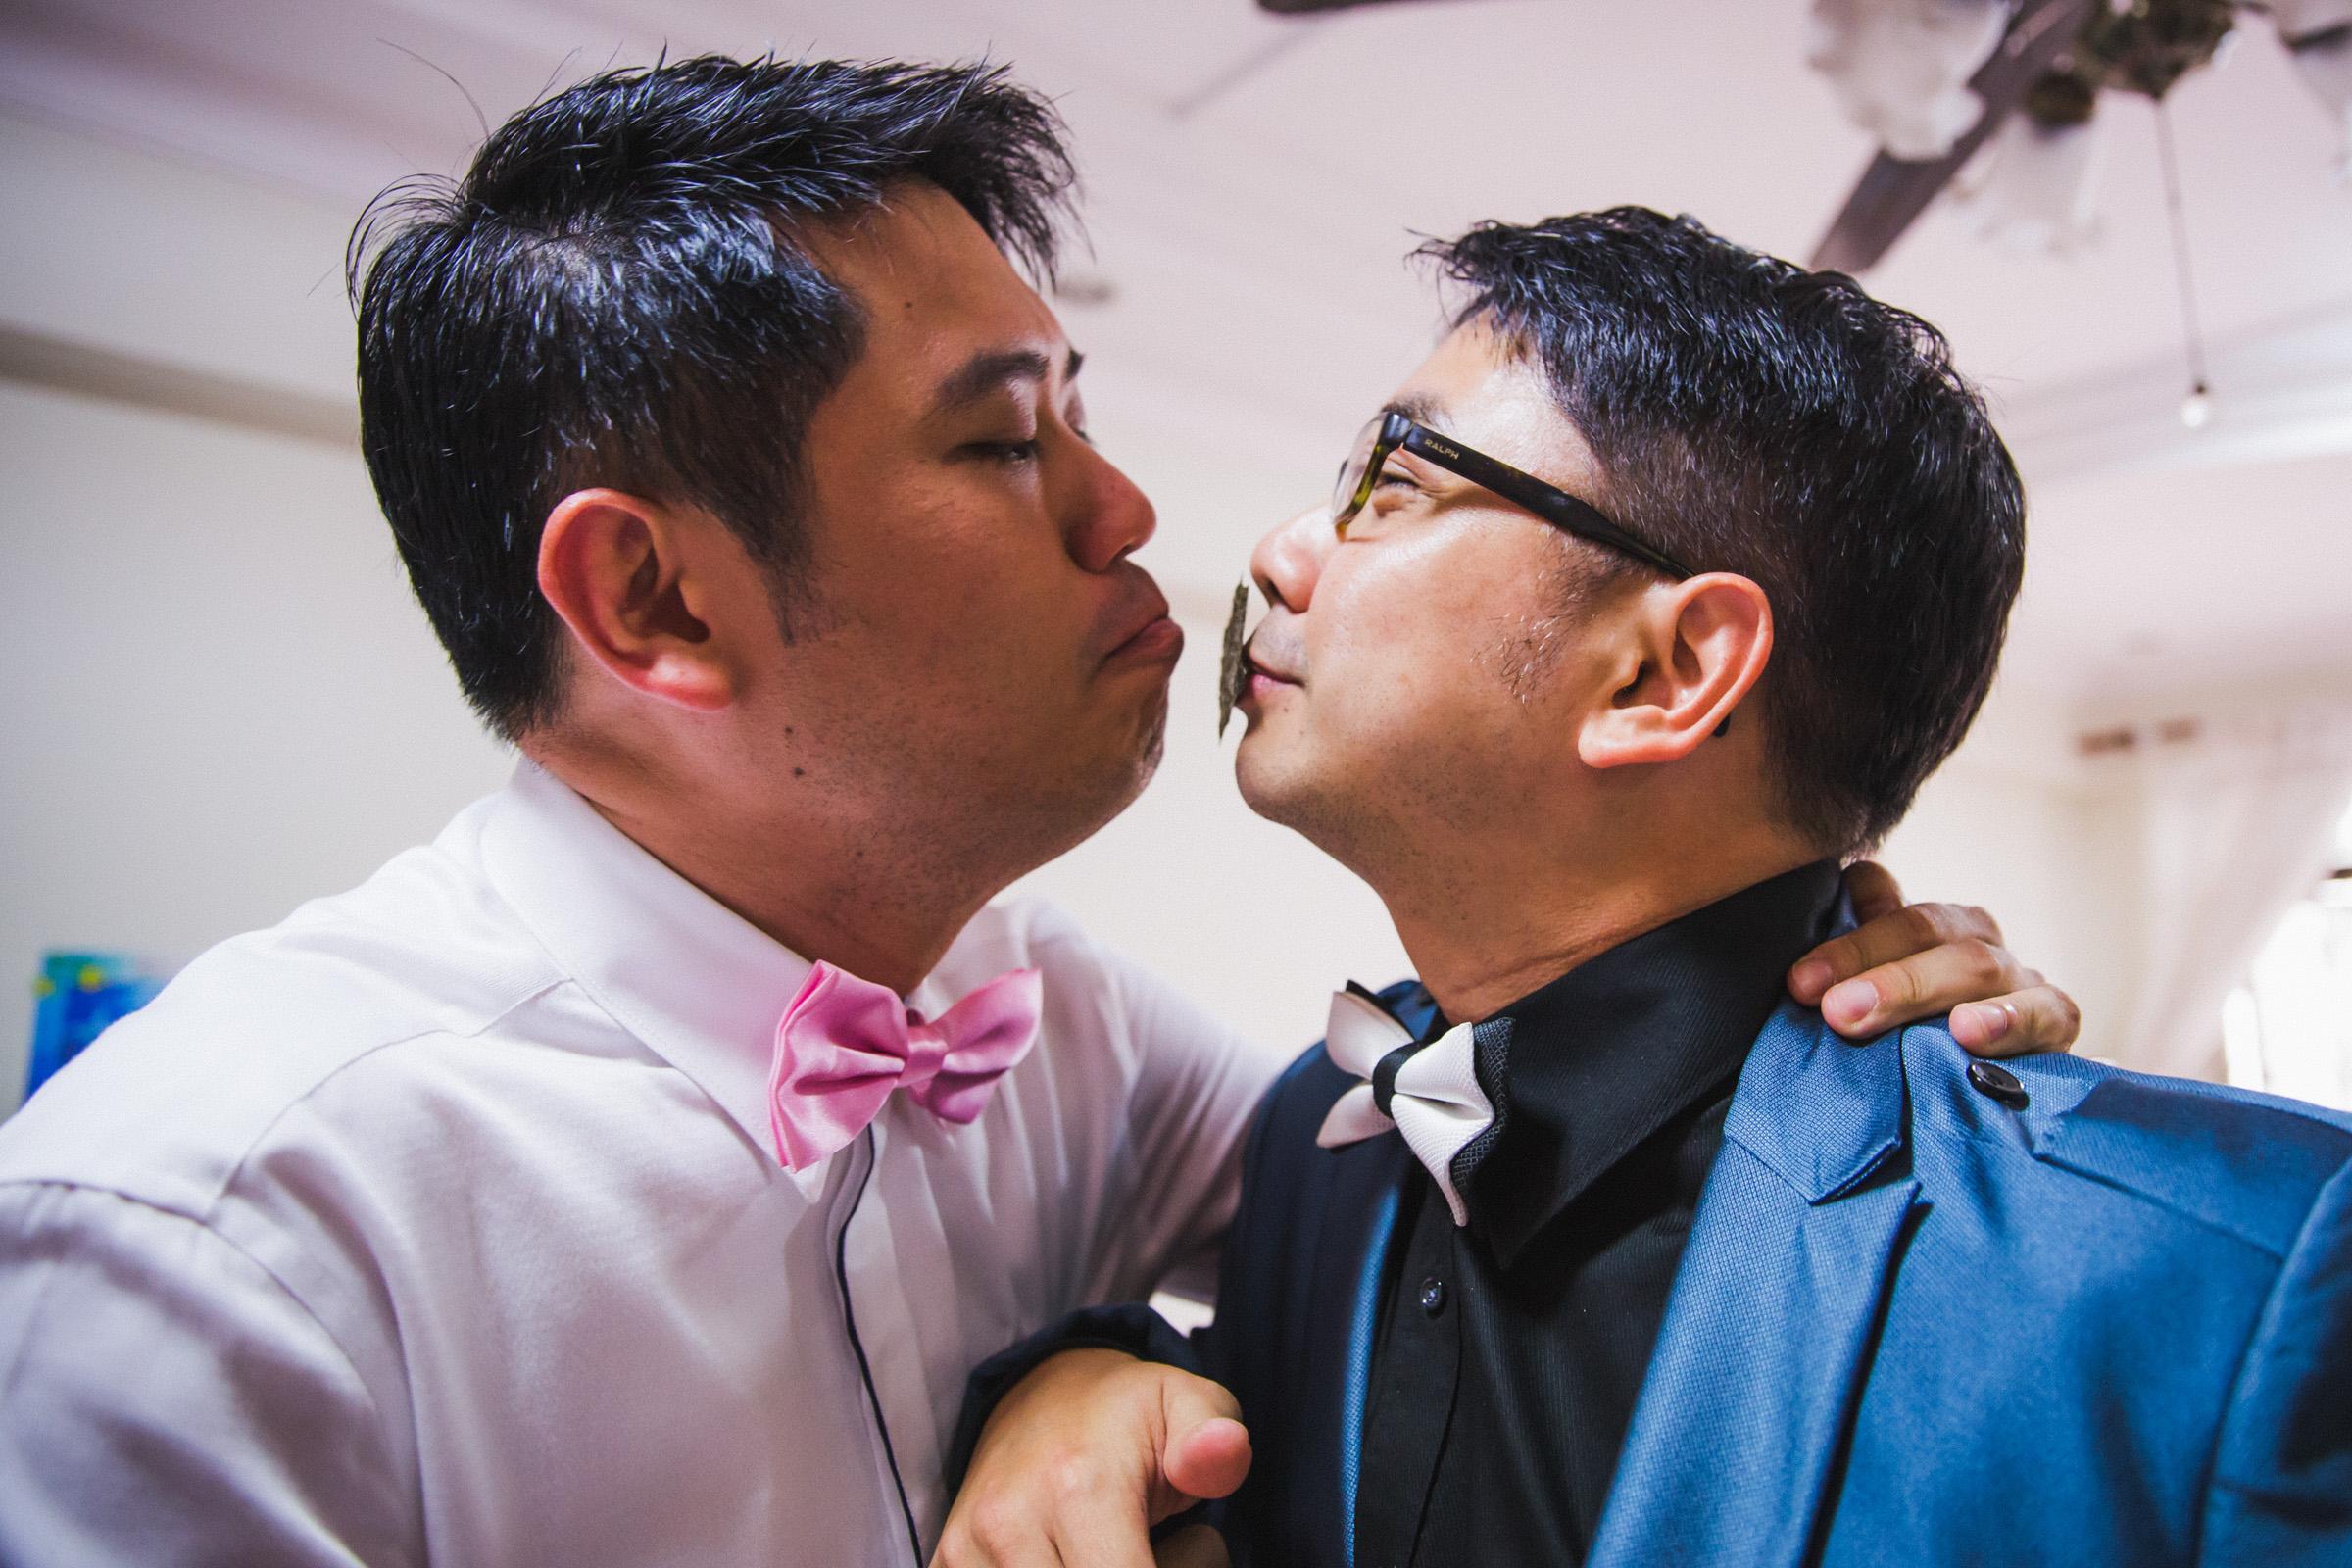 Steven_Jasmine_Wedding_Walldrobe Photography_Wedding shoots_Actual day wedding_Photographer (12)